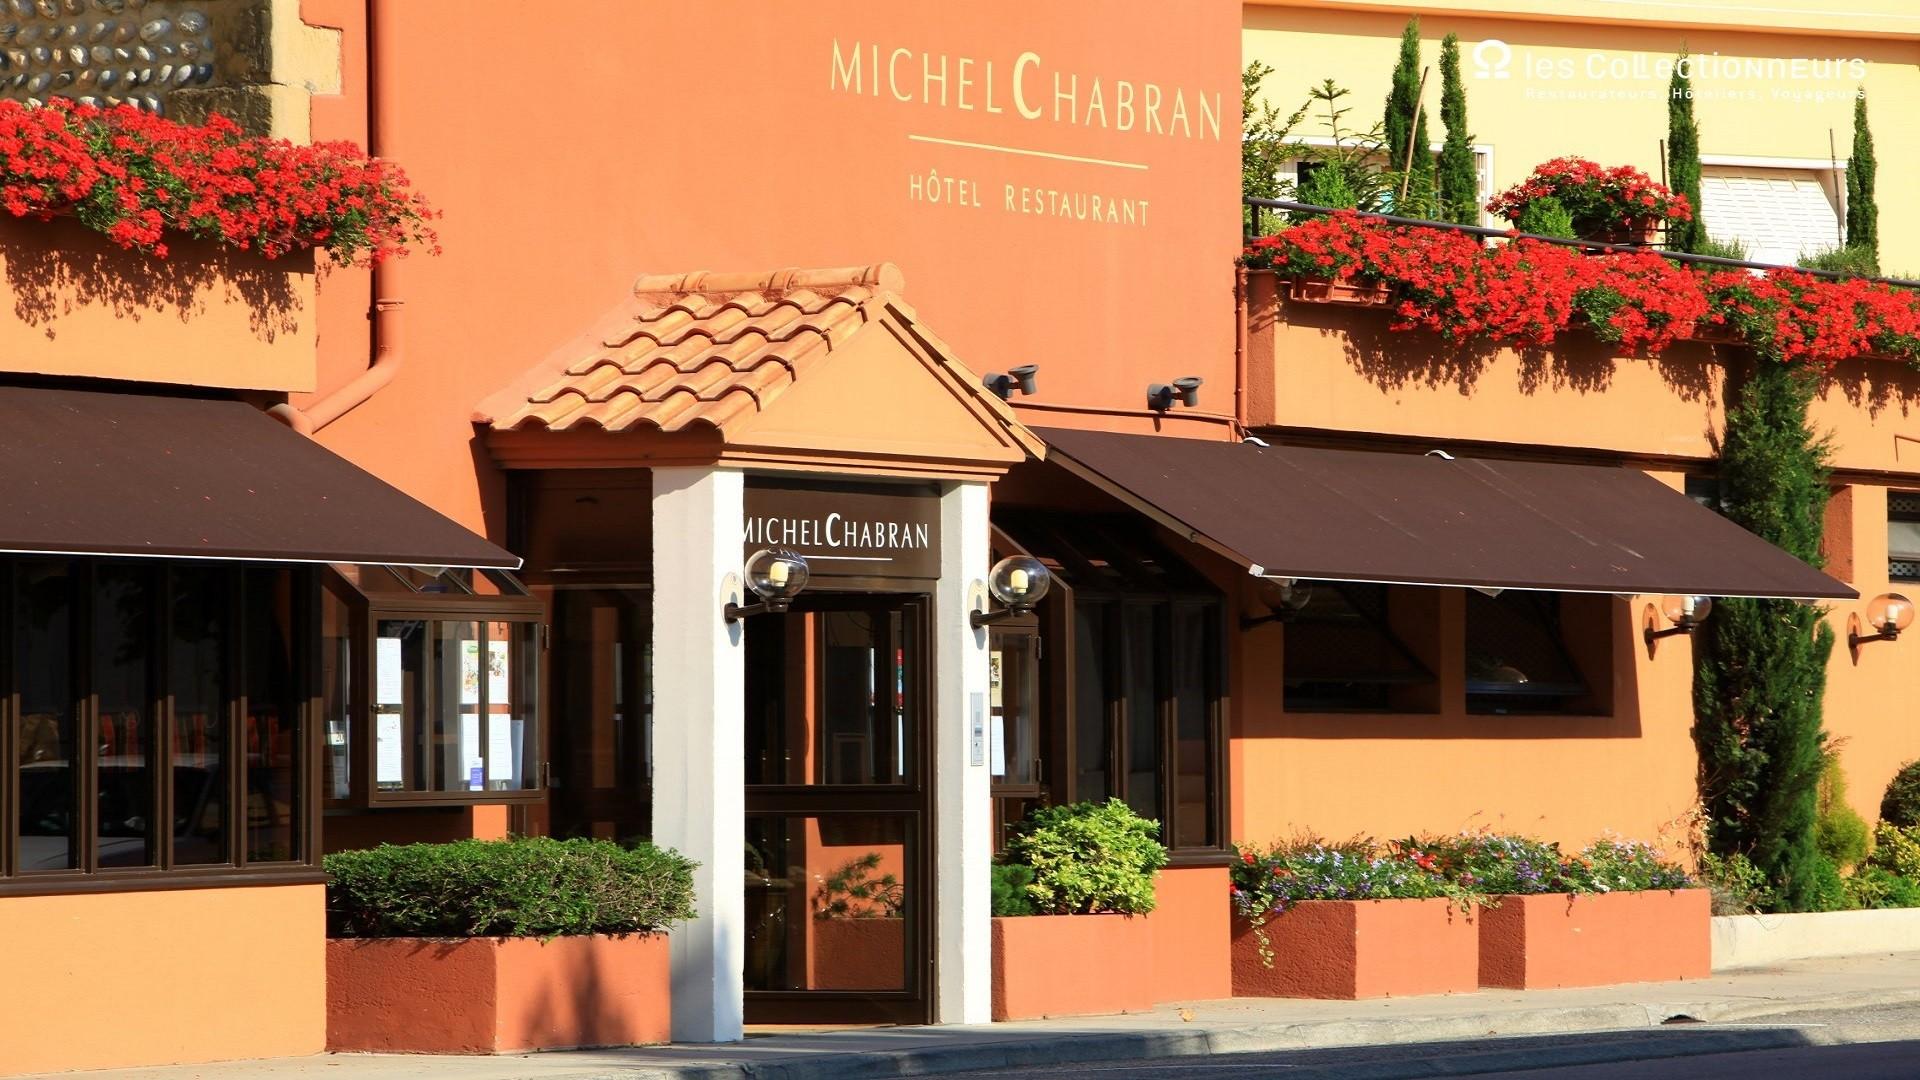 maison-michel-chabran-valence-drome-chef-etoiles-michelin-seminaires-de-caractere